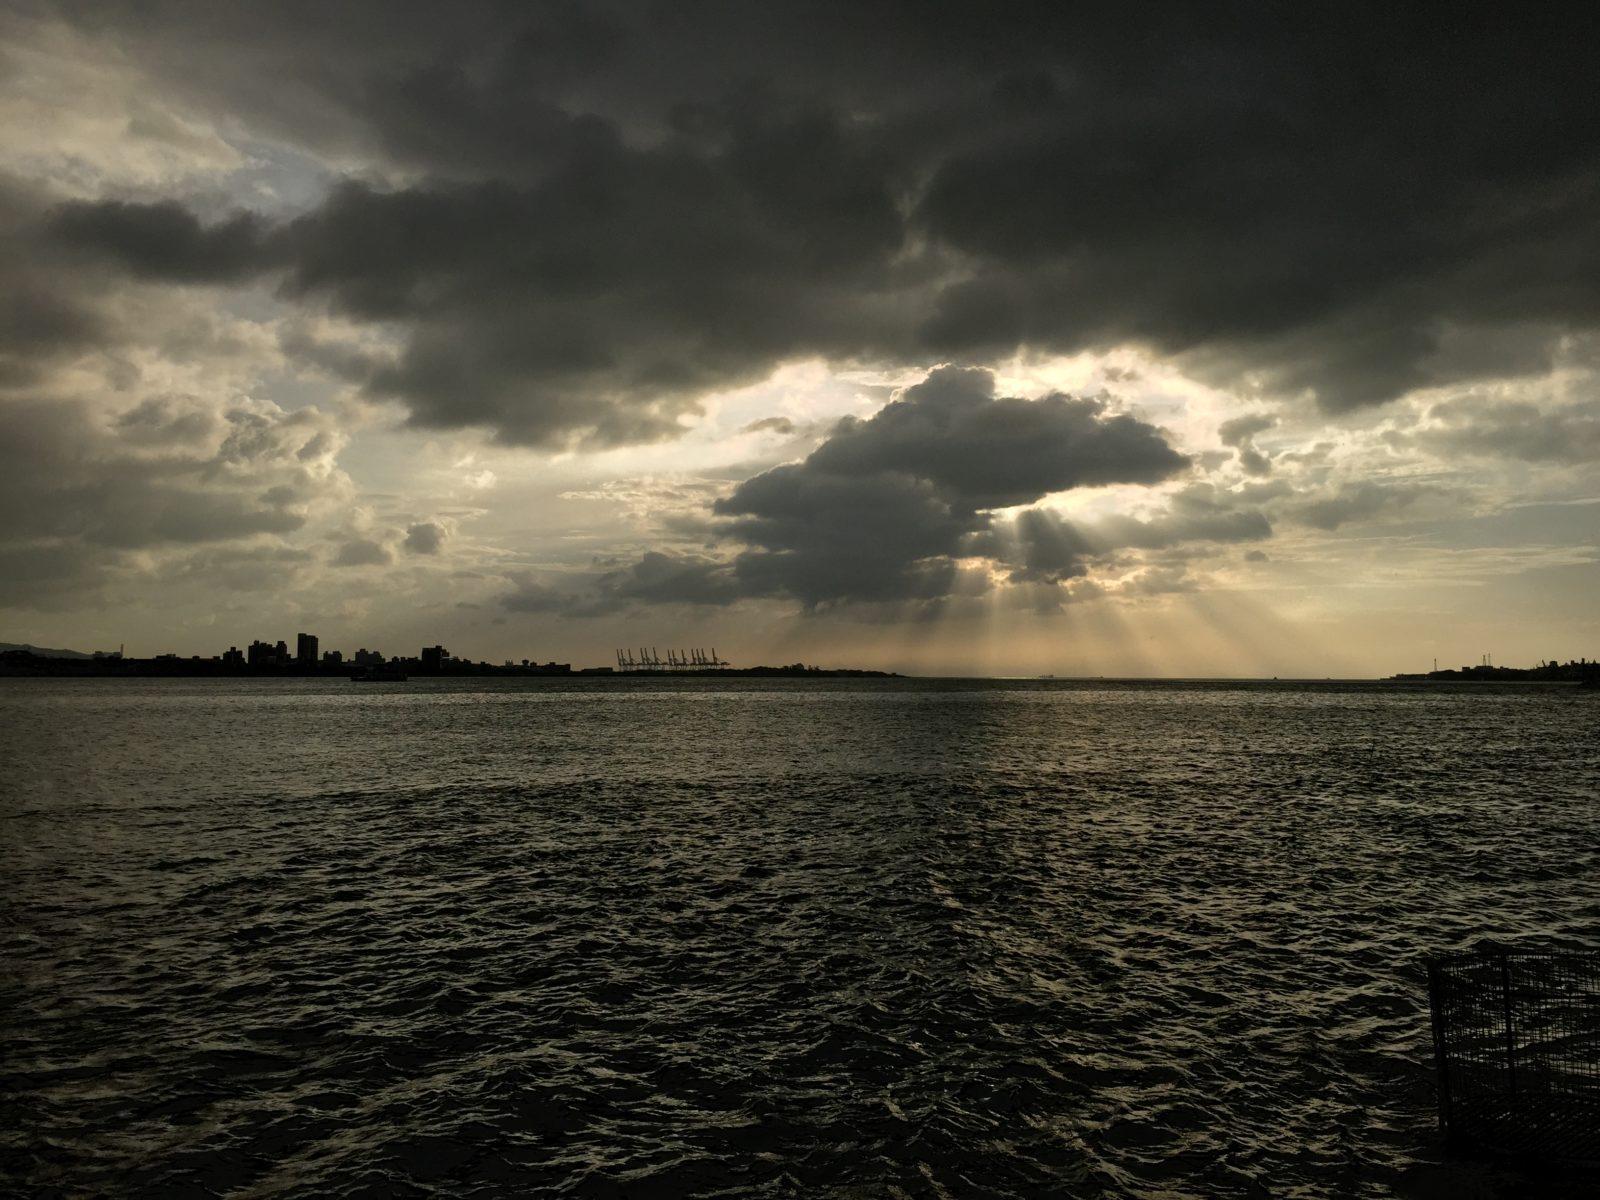 Su majestad domina sobre toda tempestad